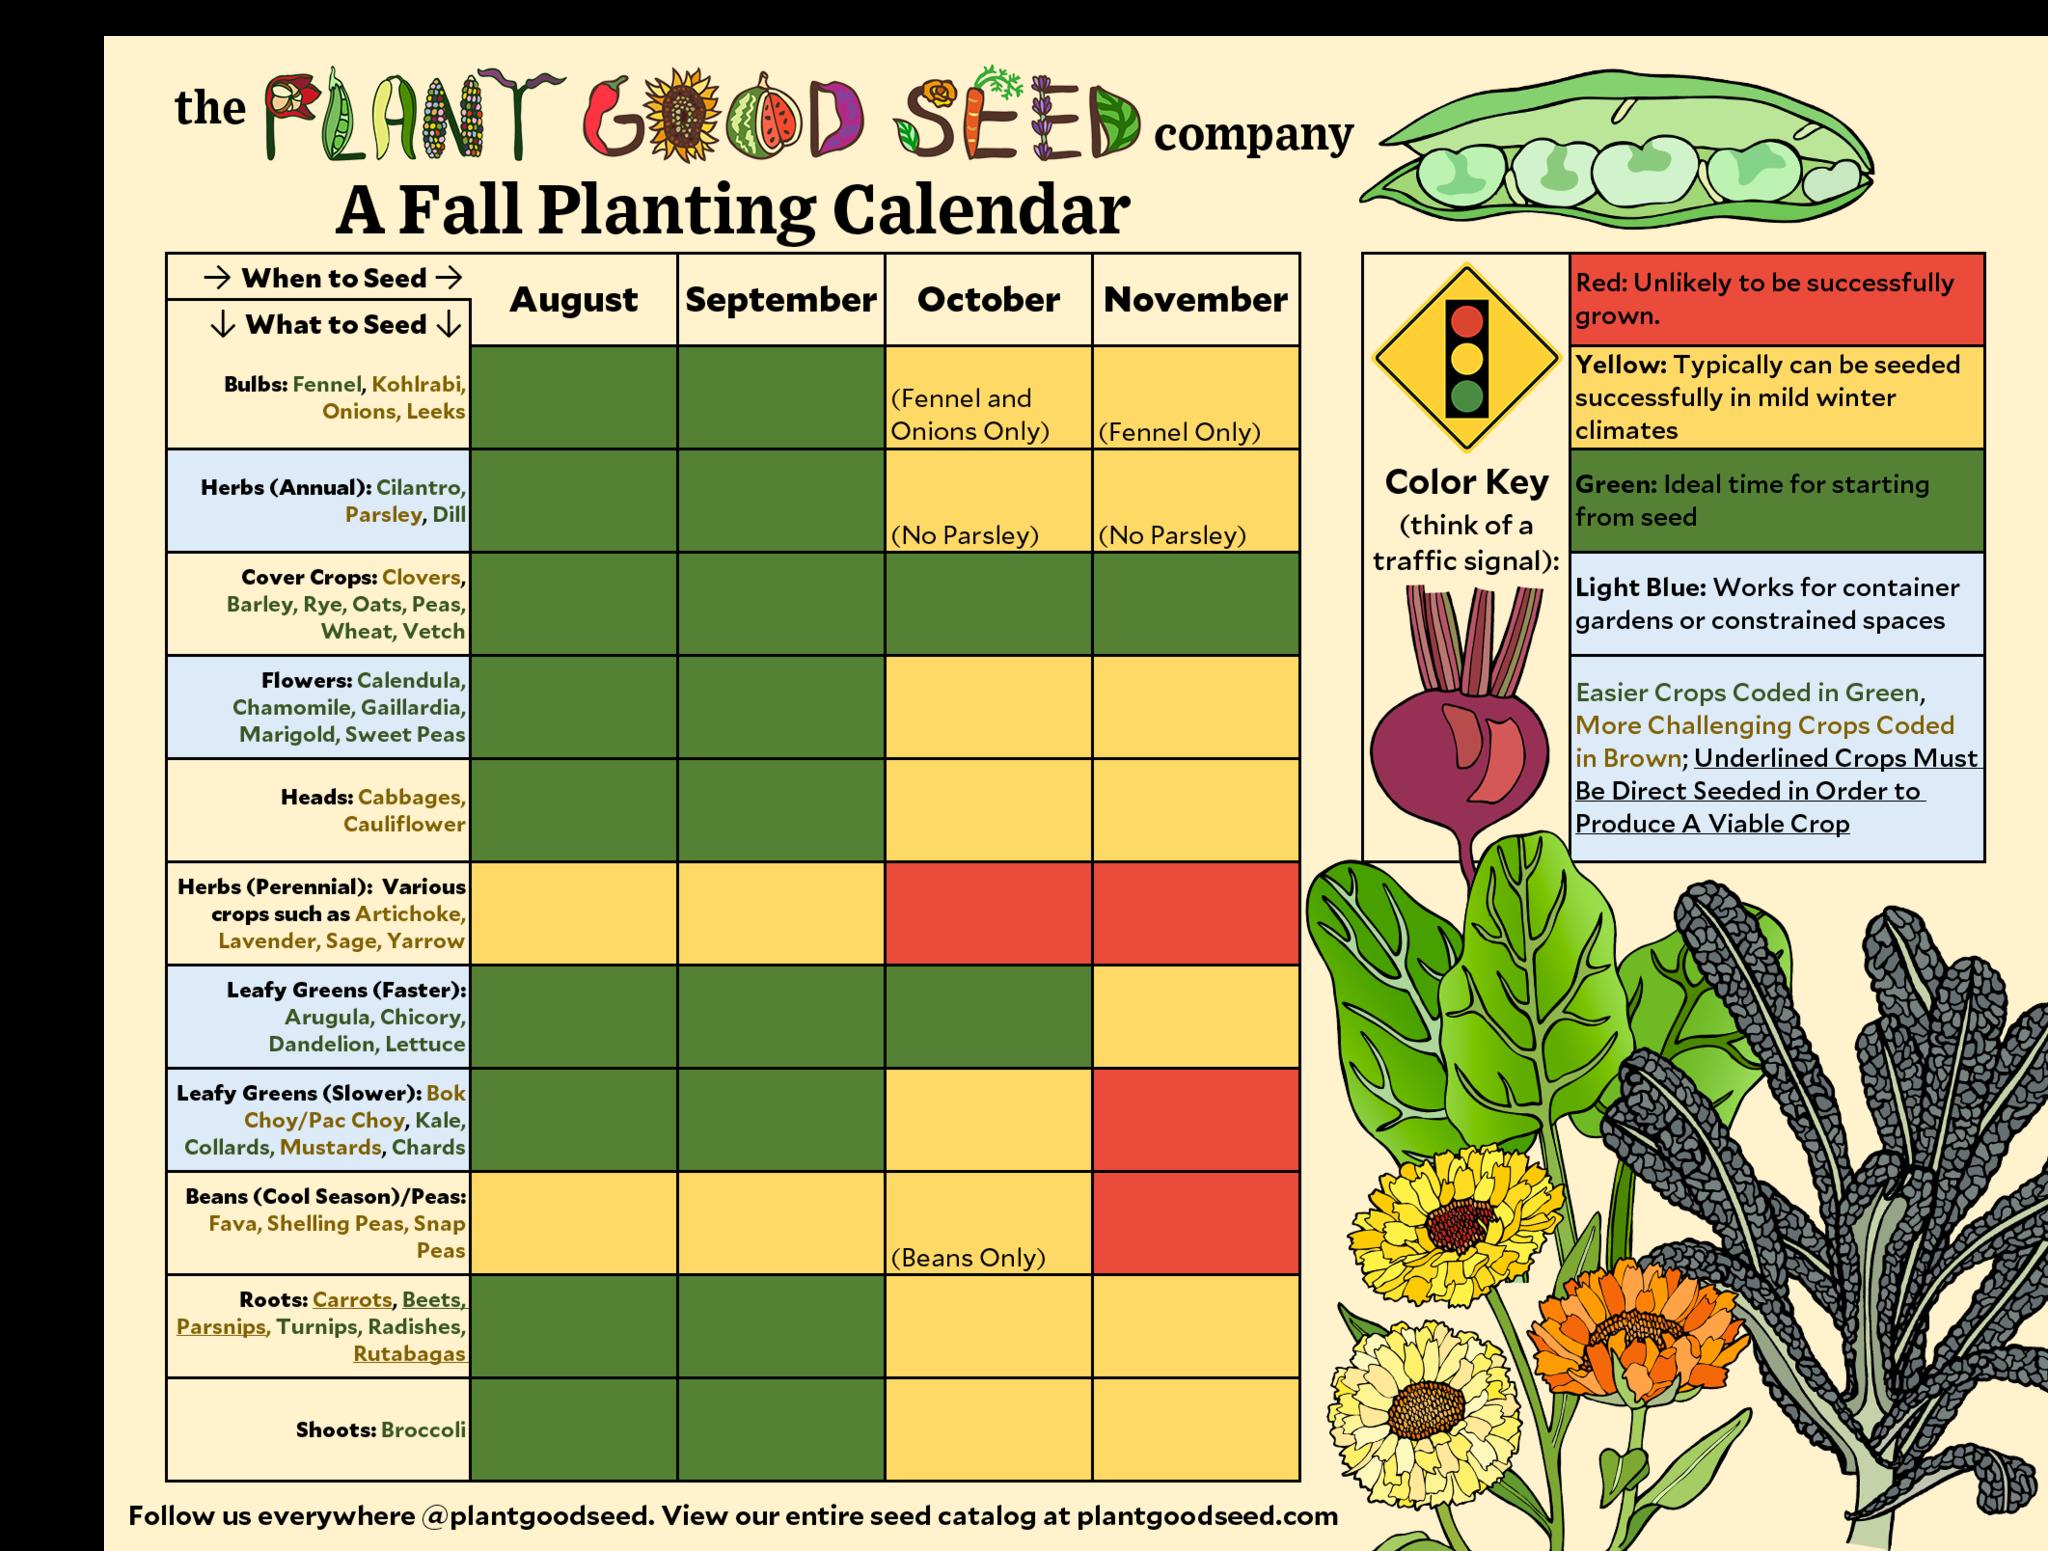 Seasonal Crop Planting Calendars The Plant Good Seed